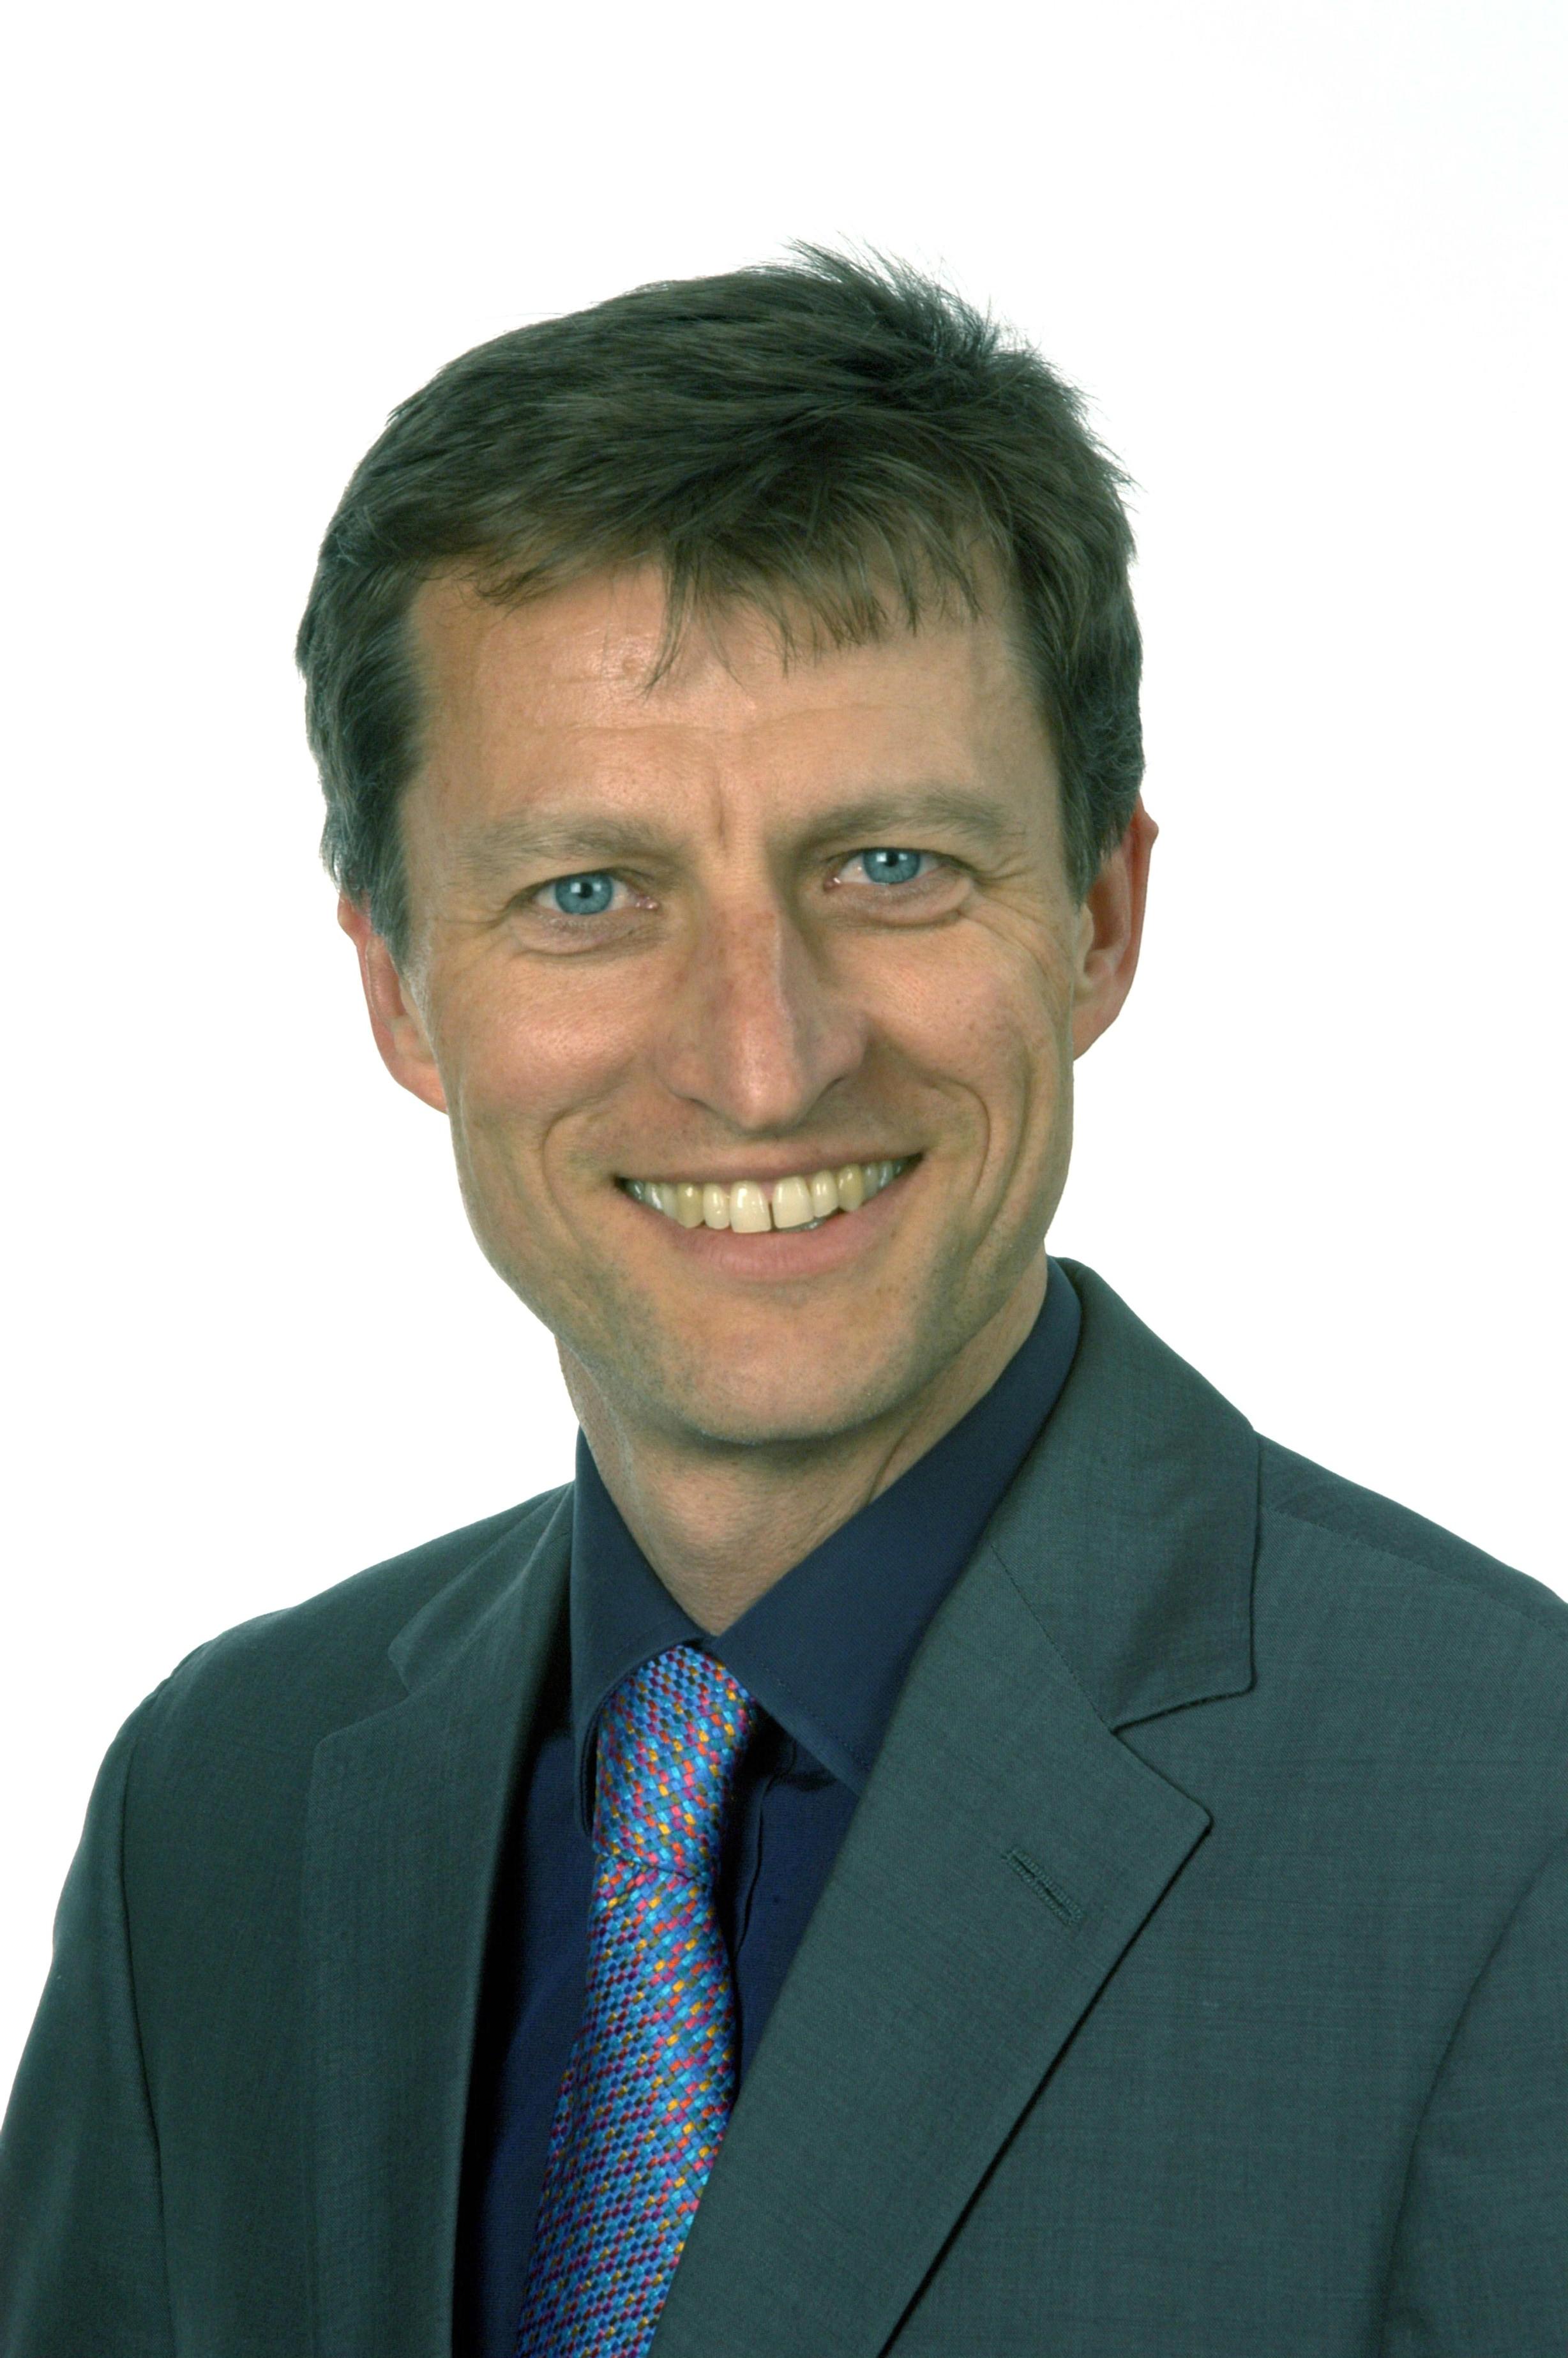 Rechtsanwalt Carsten Köbisch